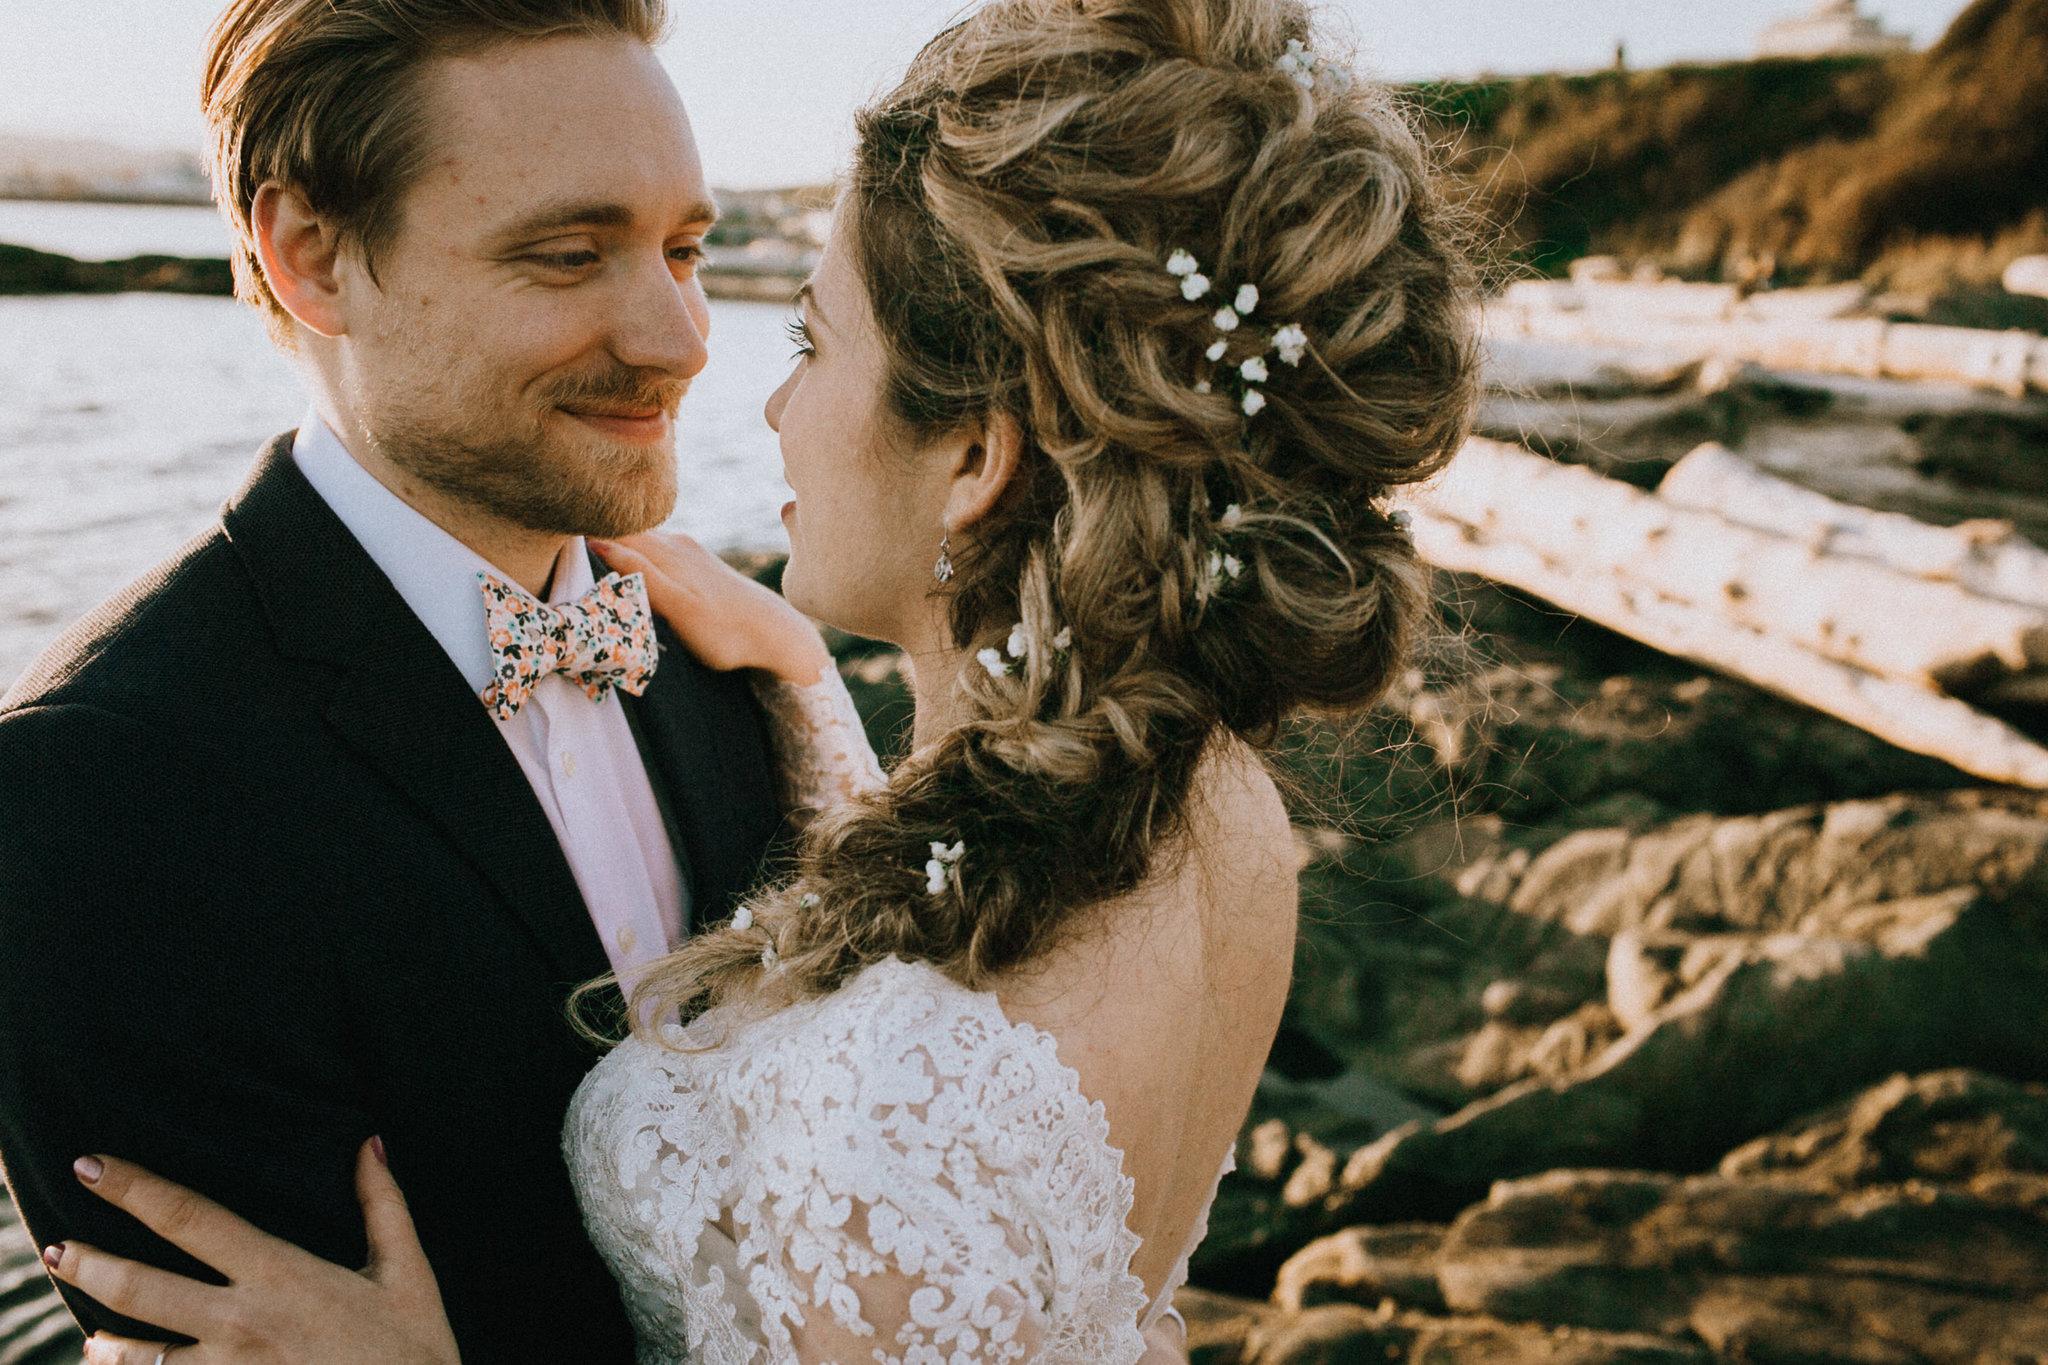 Beach Bridal Session Artistry by Alexa Babys Breath in Brides Hair West Coast Weddings Magazine